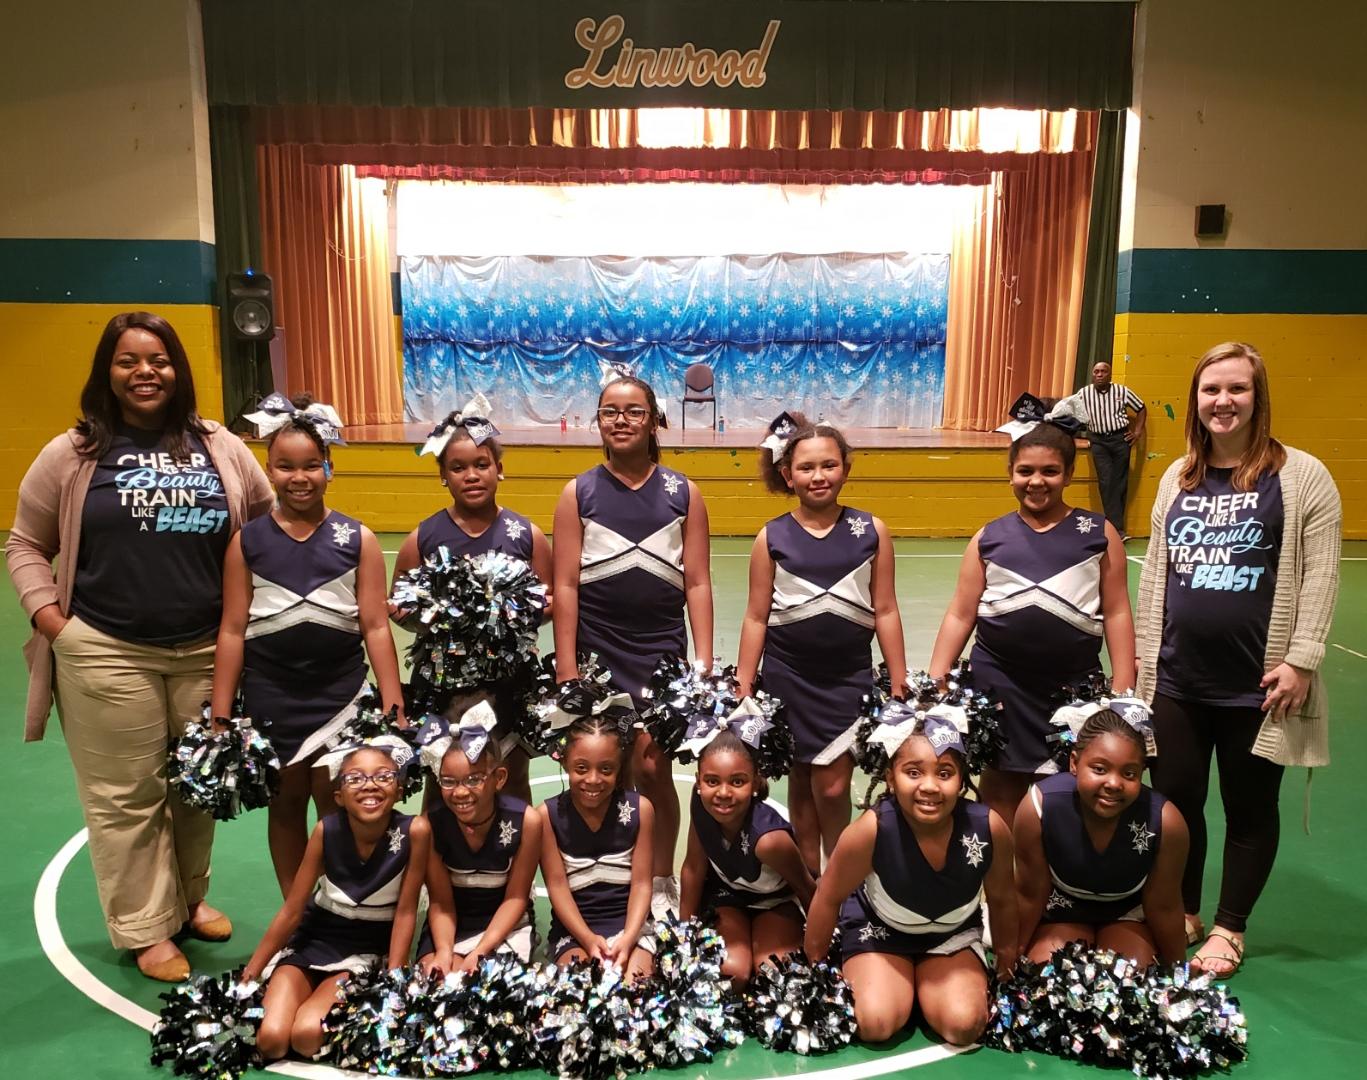 Girls Cheerleaders and Coaches